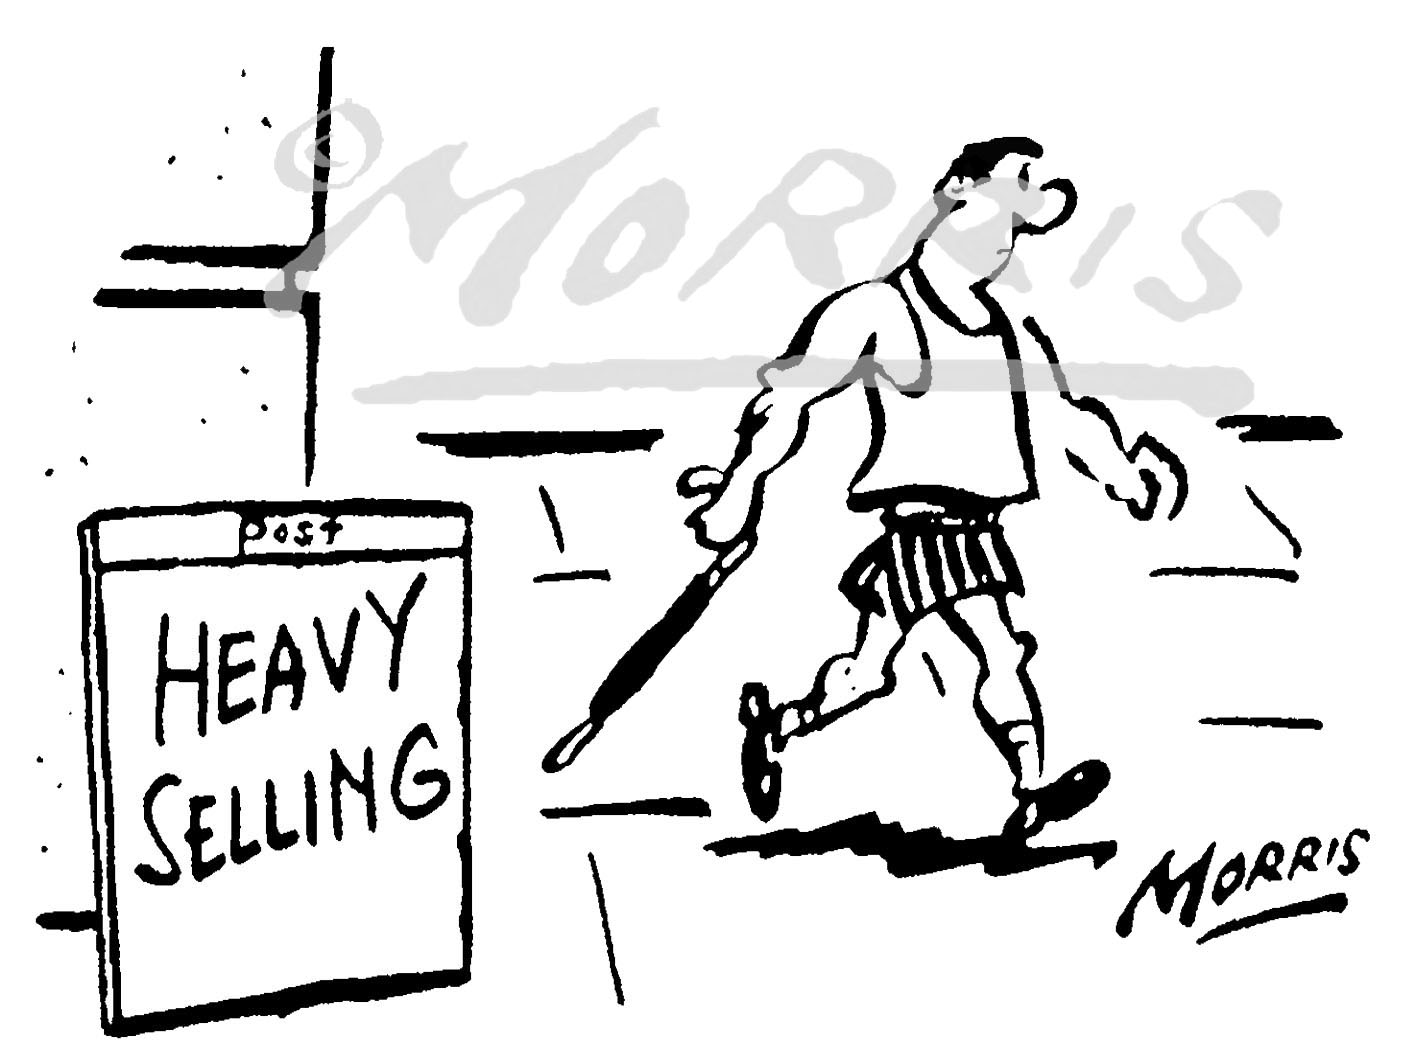 Stock Market heavy selling cartoon – Ref: 4832bw